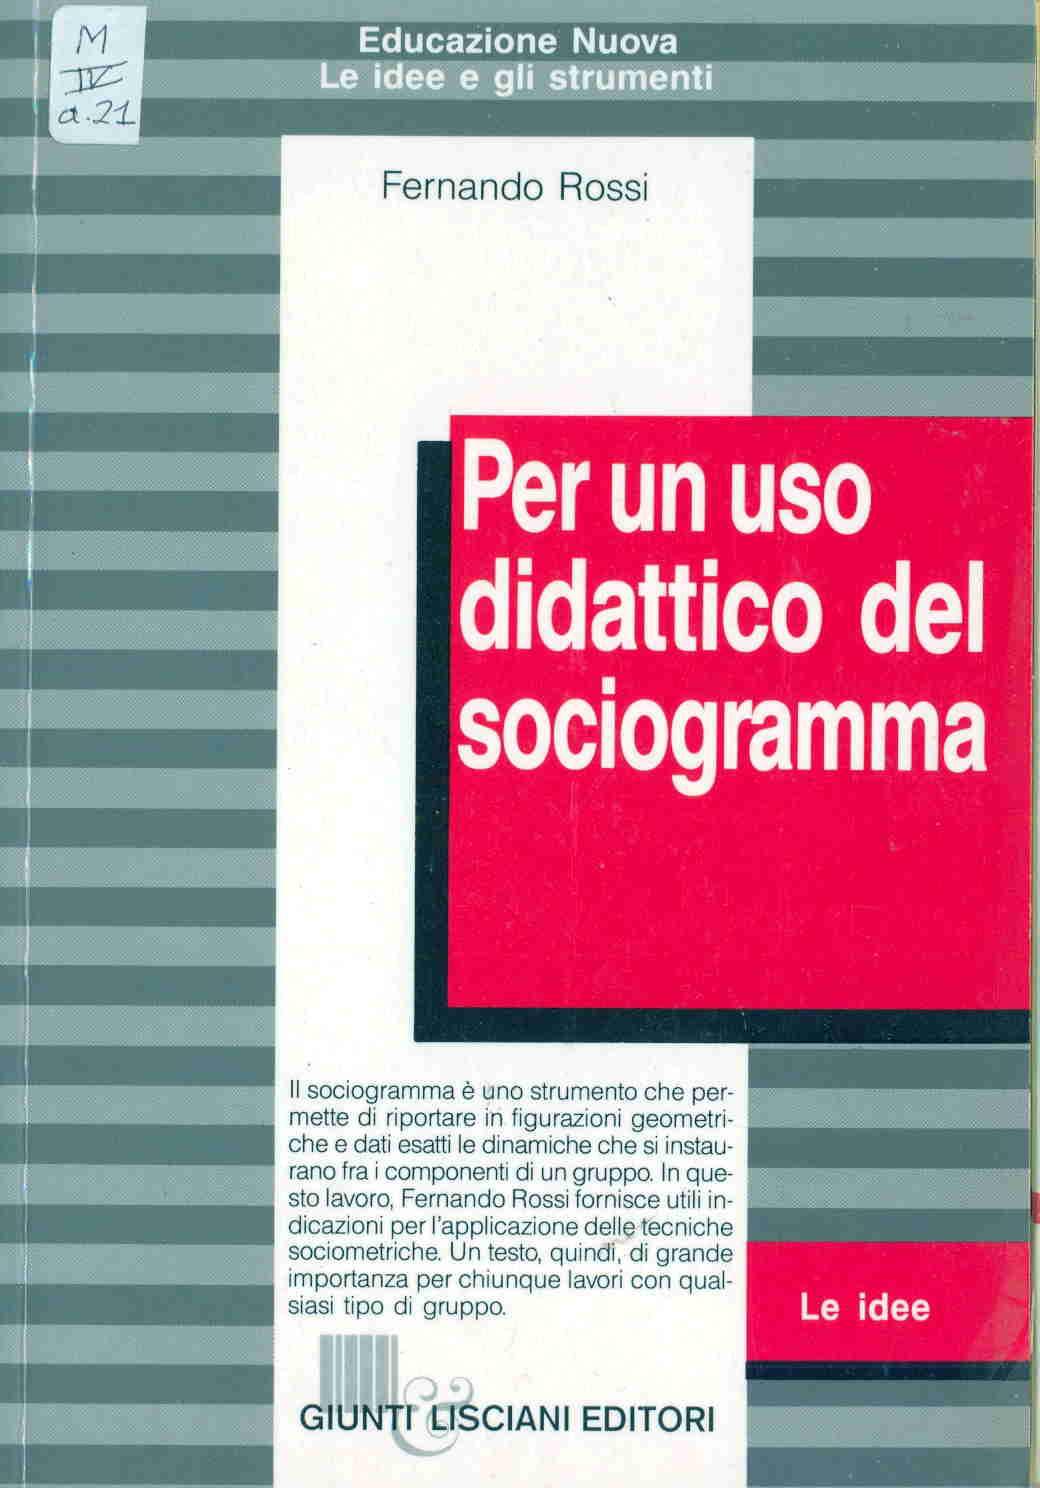 Per un uso didattico del sociogramma